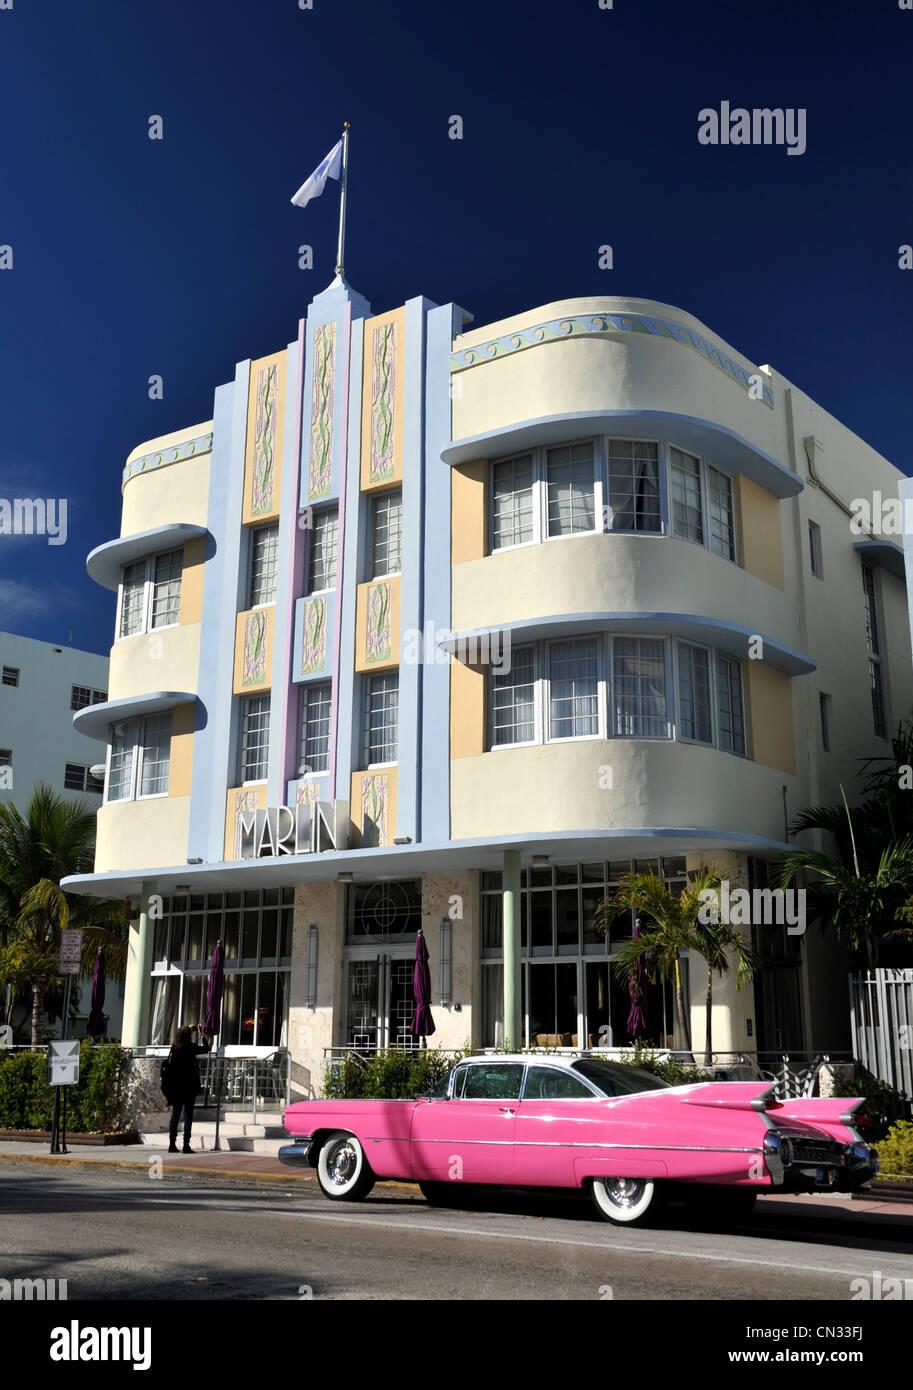 Marlin Hotel, Miami, Florida, USA Stockbild